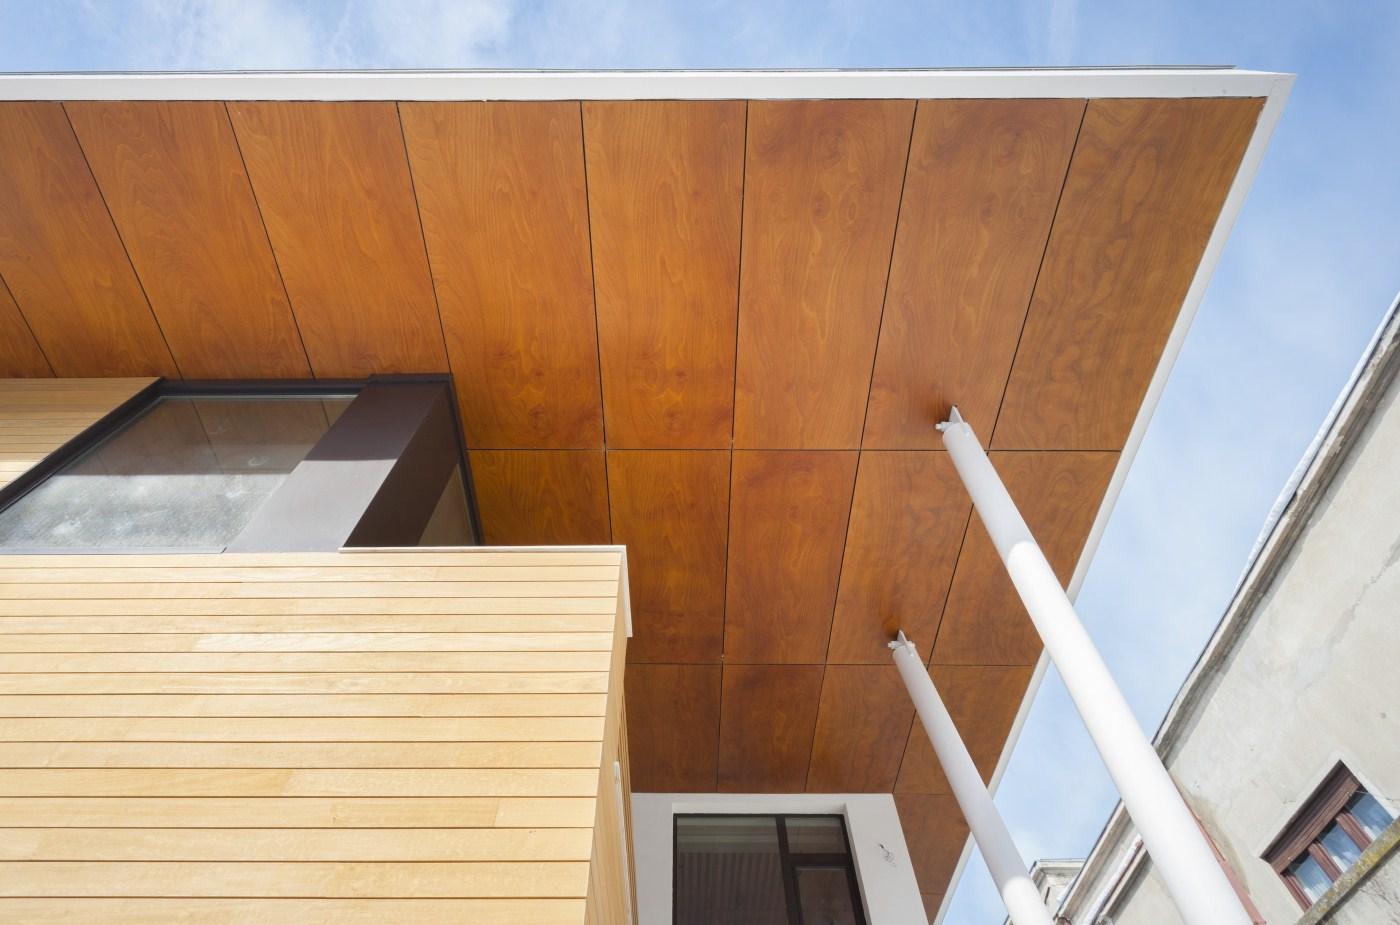 https://nbc-arhitect.ro/wp-content/uploads/2020/10/NBC-ARHITECT-_-housing-_-Sandu-Aldea-House-Villa-_-exterior-view_4.jpg